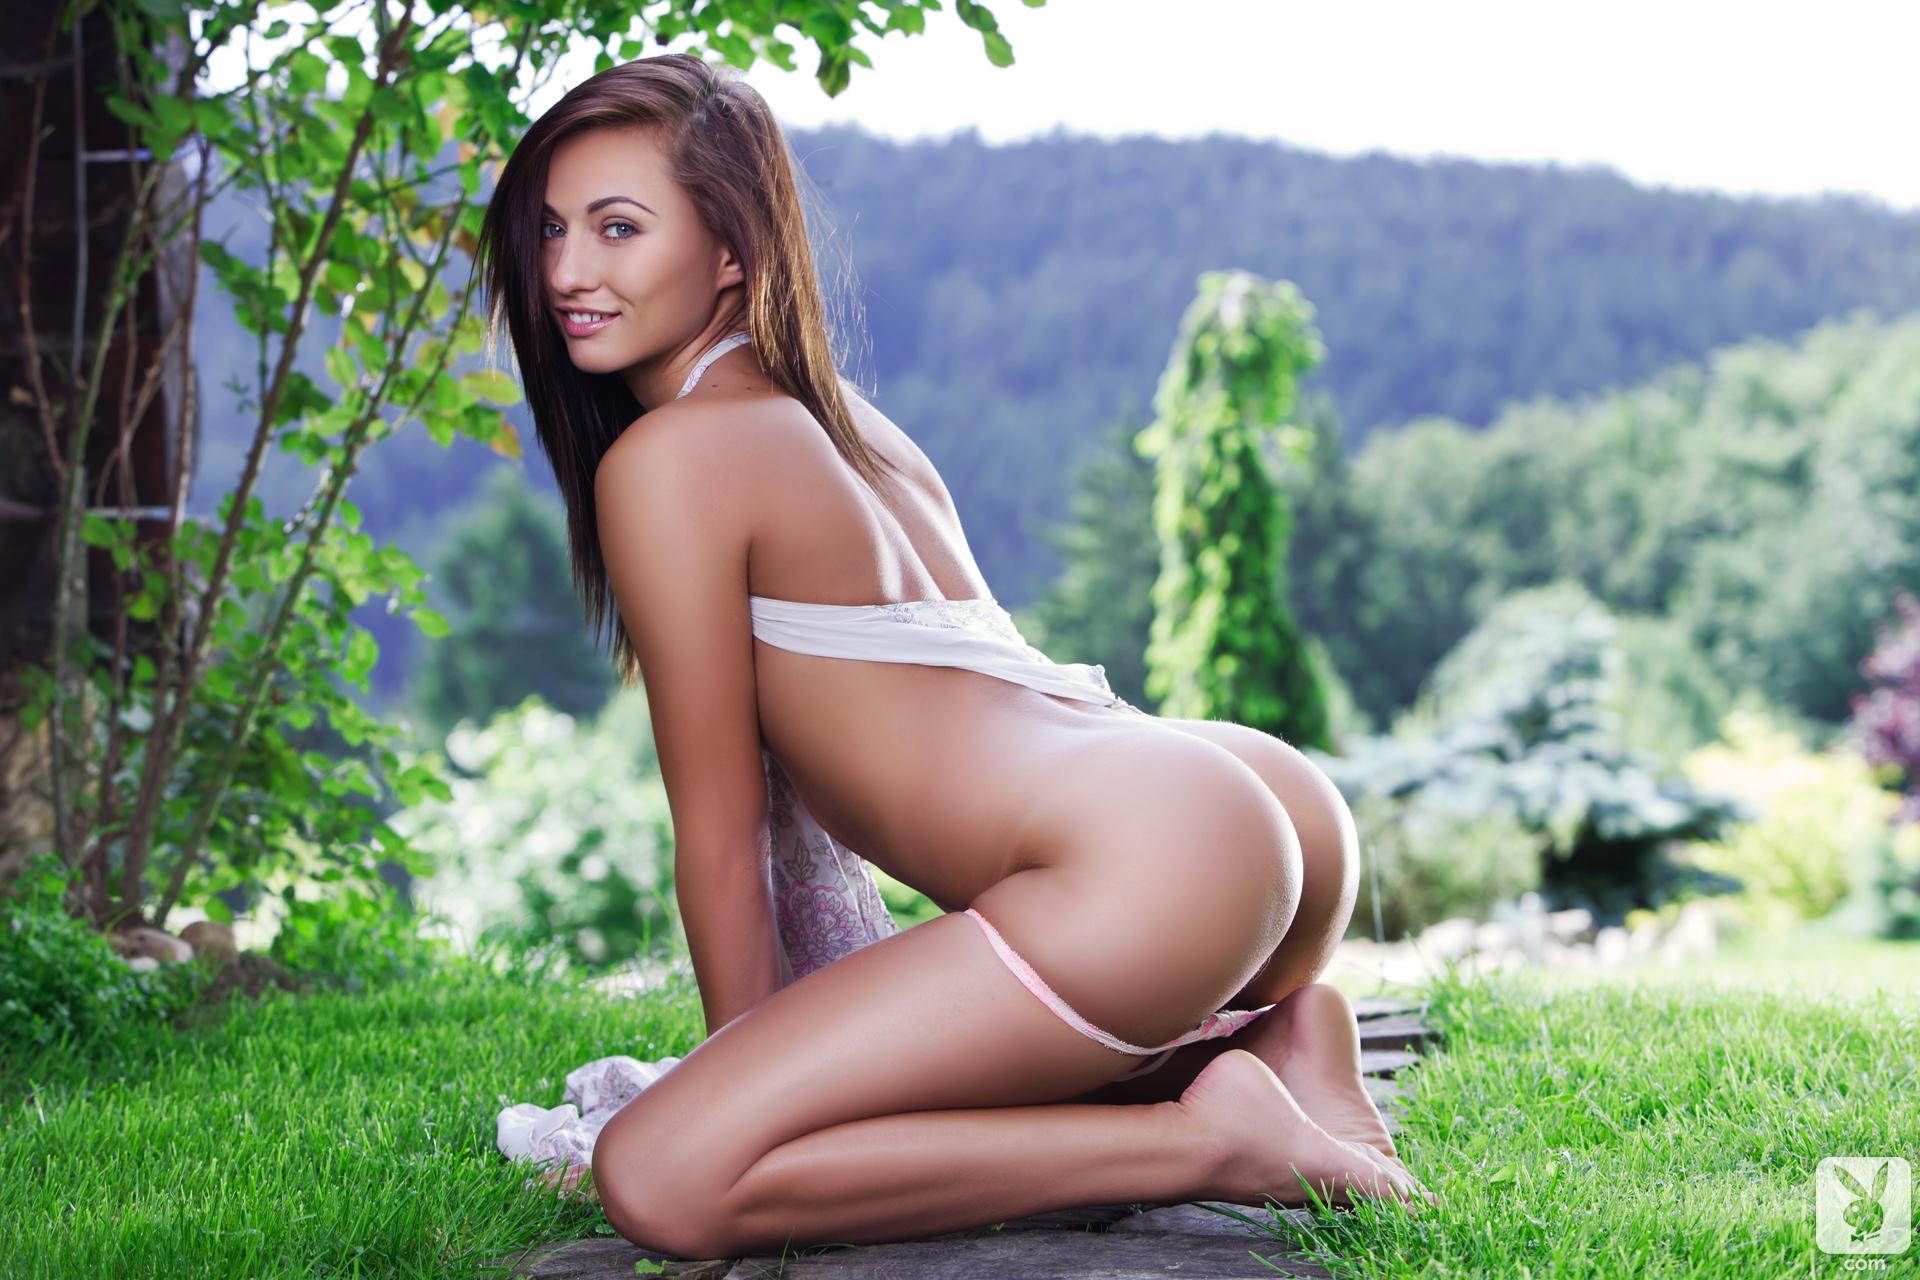 Czech erotic models #7